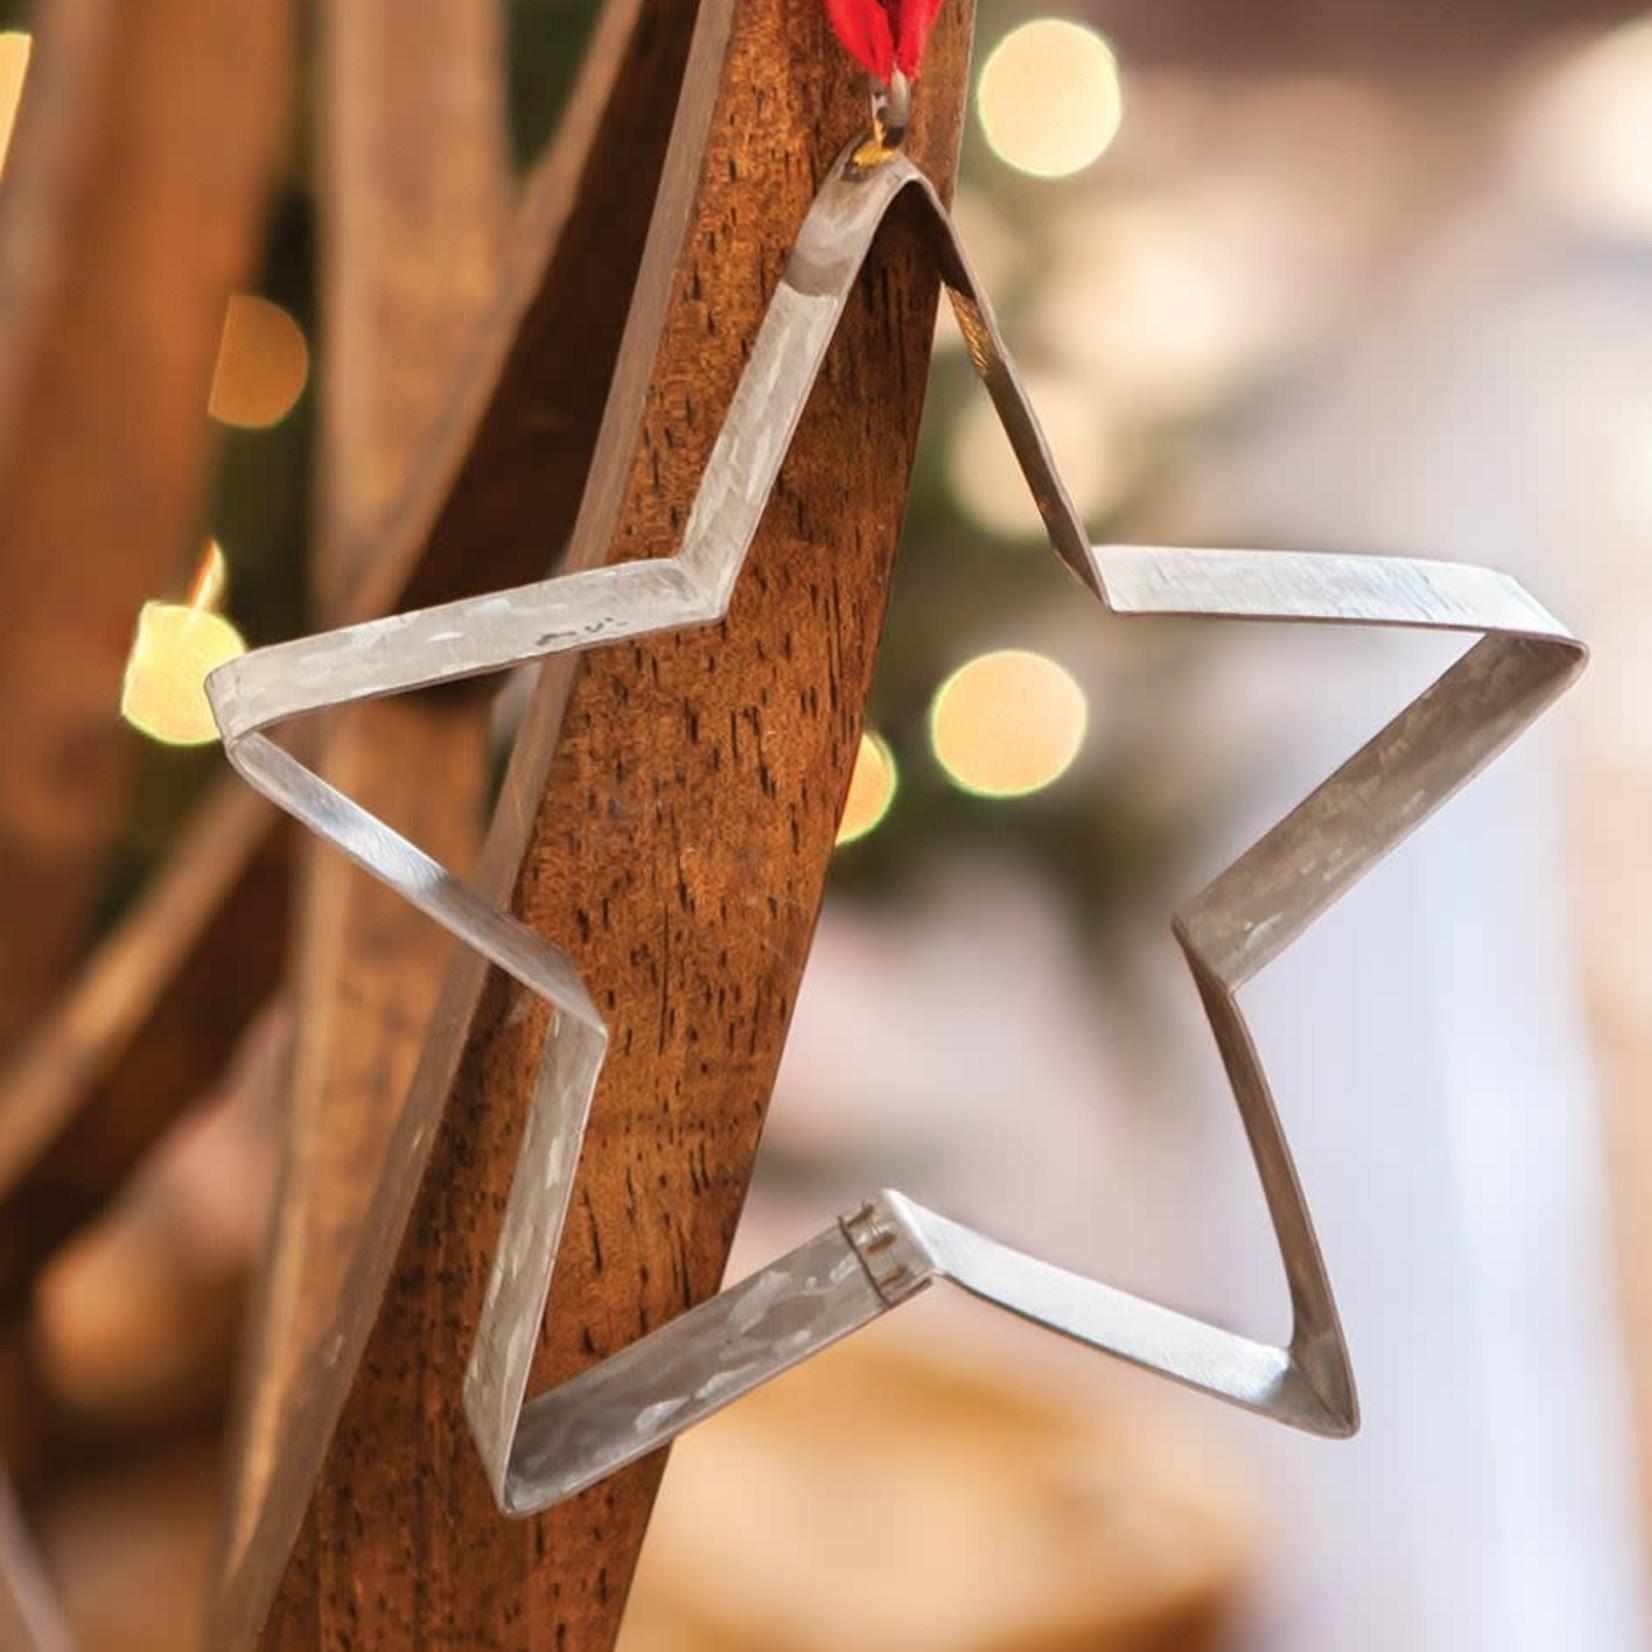 Star Cookie Cutter Ornament